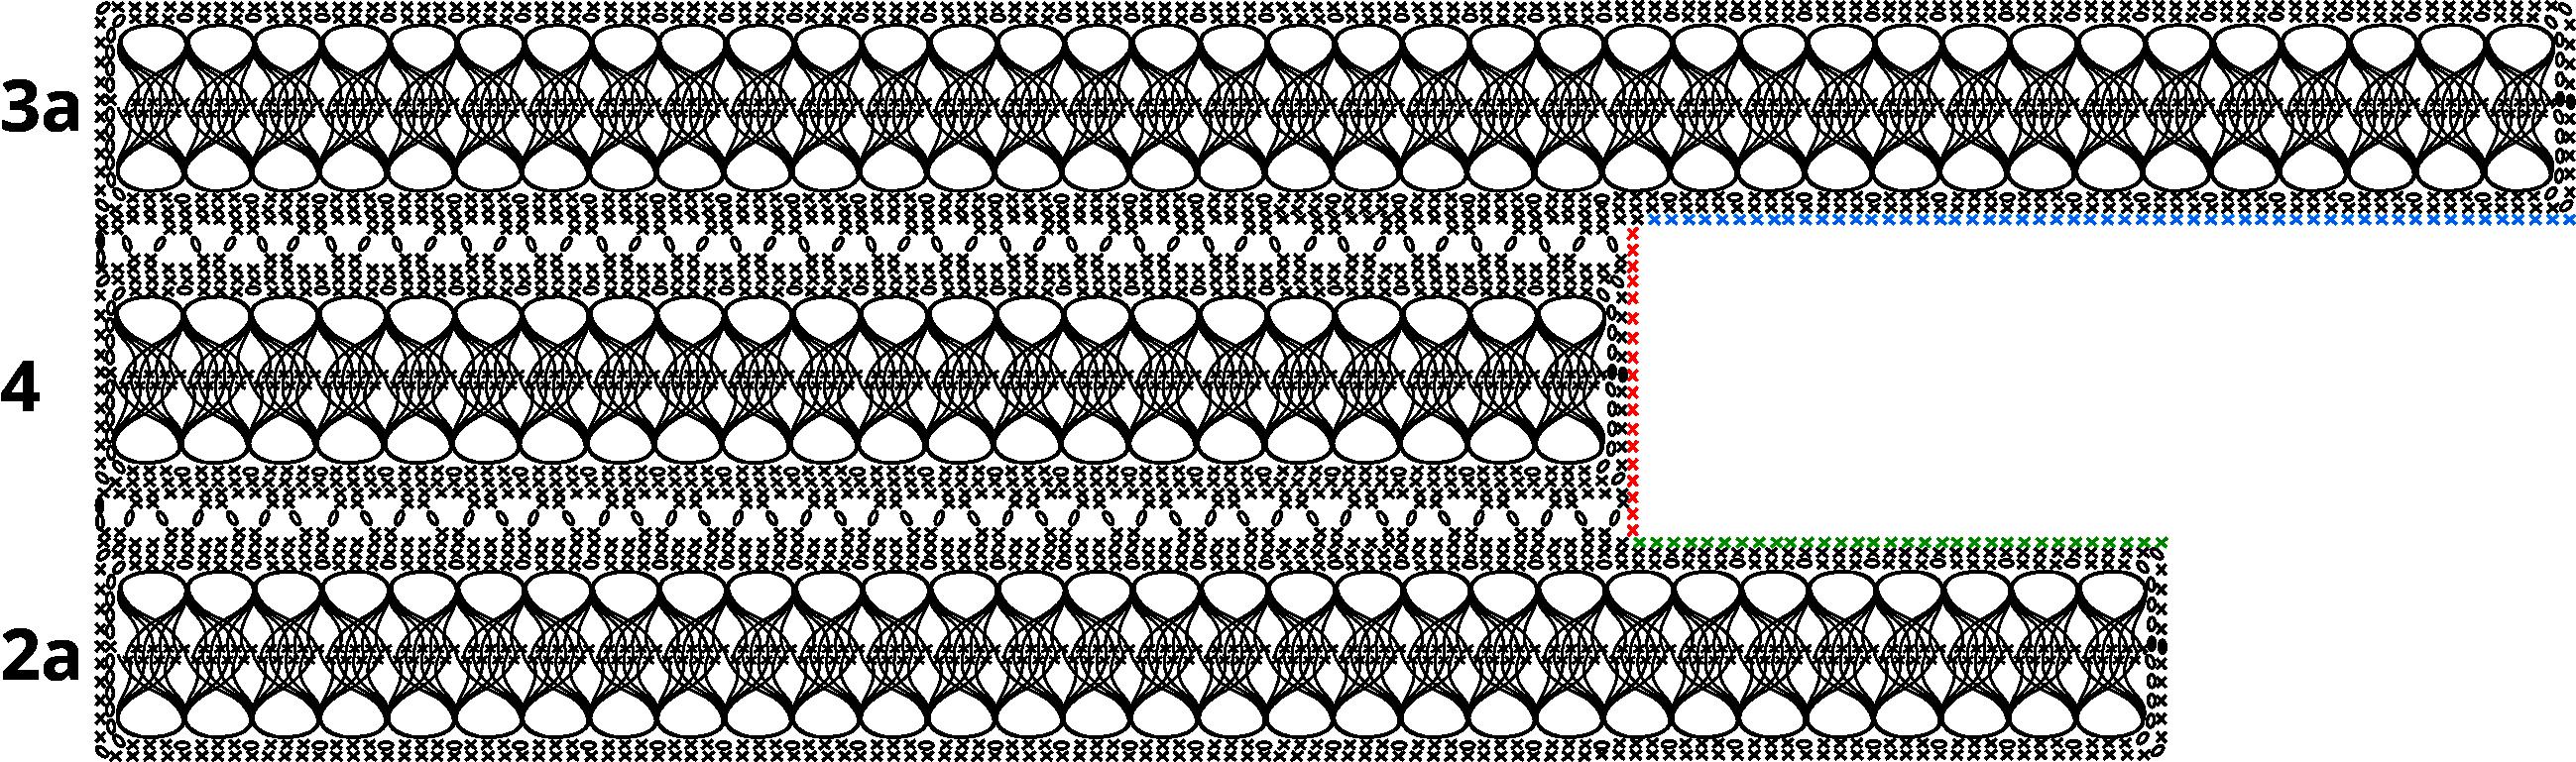 Gratis guimpepatroon - bruinzwarte trui - baan 2a-3a-4